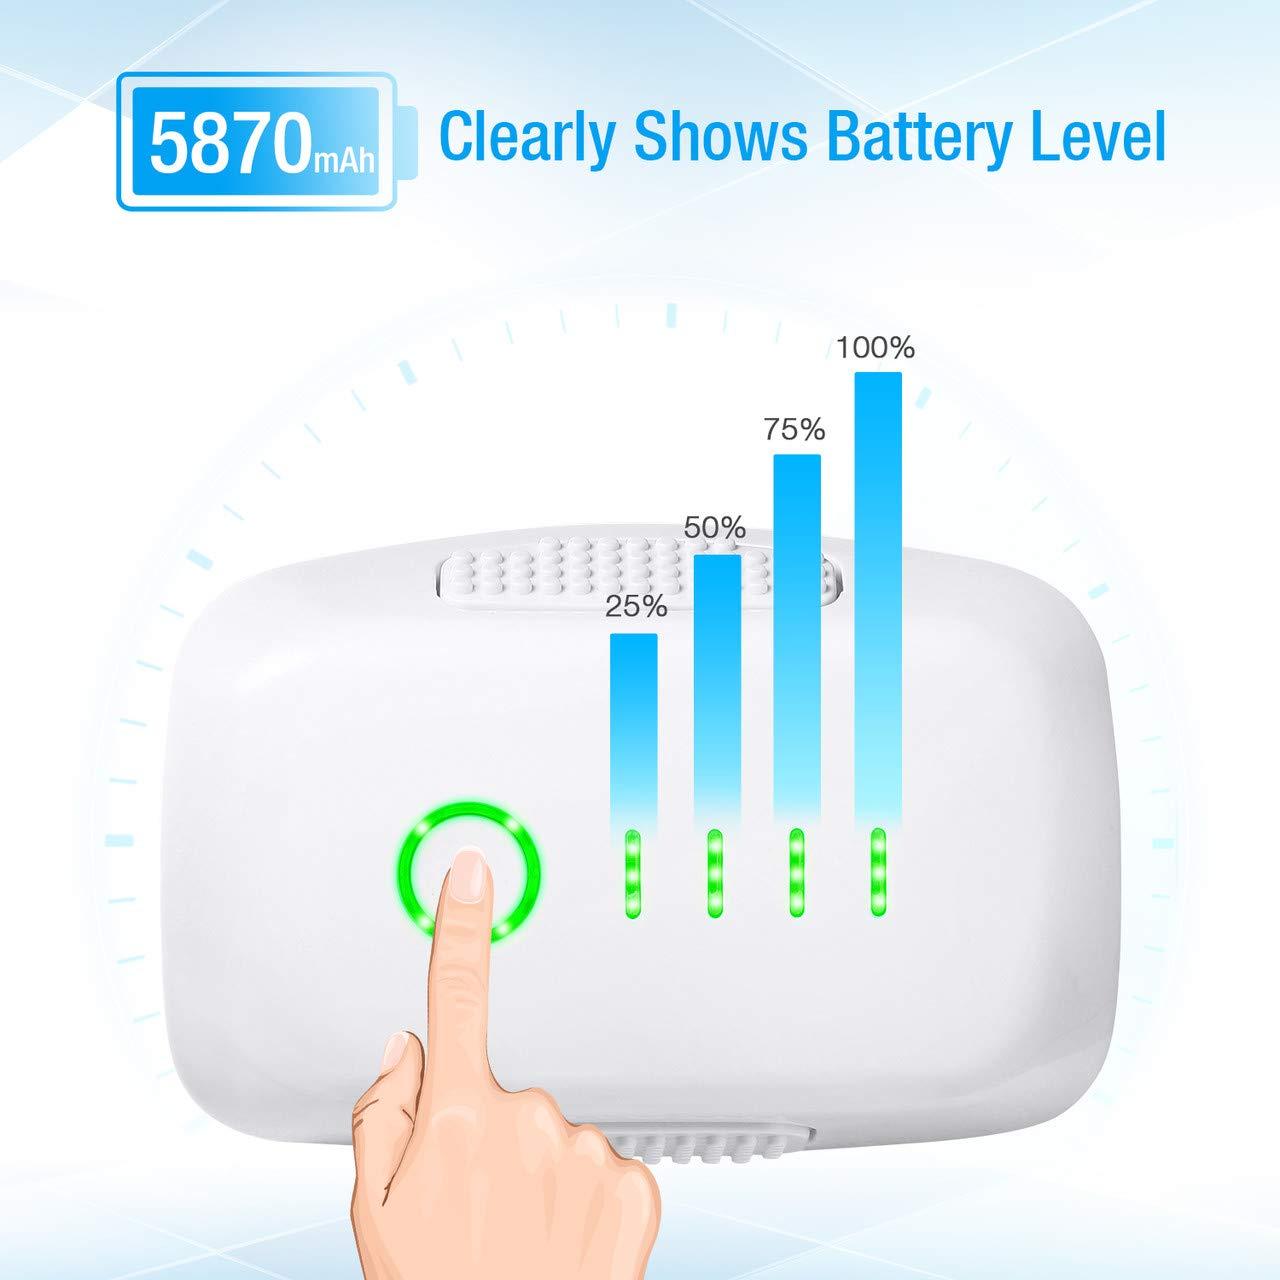 Powerextra High Capacity Phantom 4 Series (15.2V 5870 mAh) LiPo Flight Battery + Battery Safe Bag Replacement for DJI Phantom 4, Phantom 4 Pro, Phantom 4 Pro V2.0, Phantom 4 Advanced Drone - Upgrade by Powerextra (Image #4)